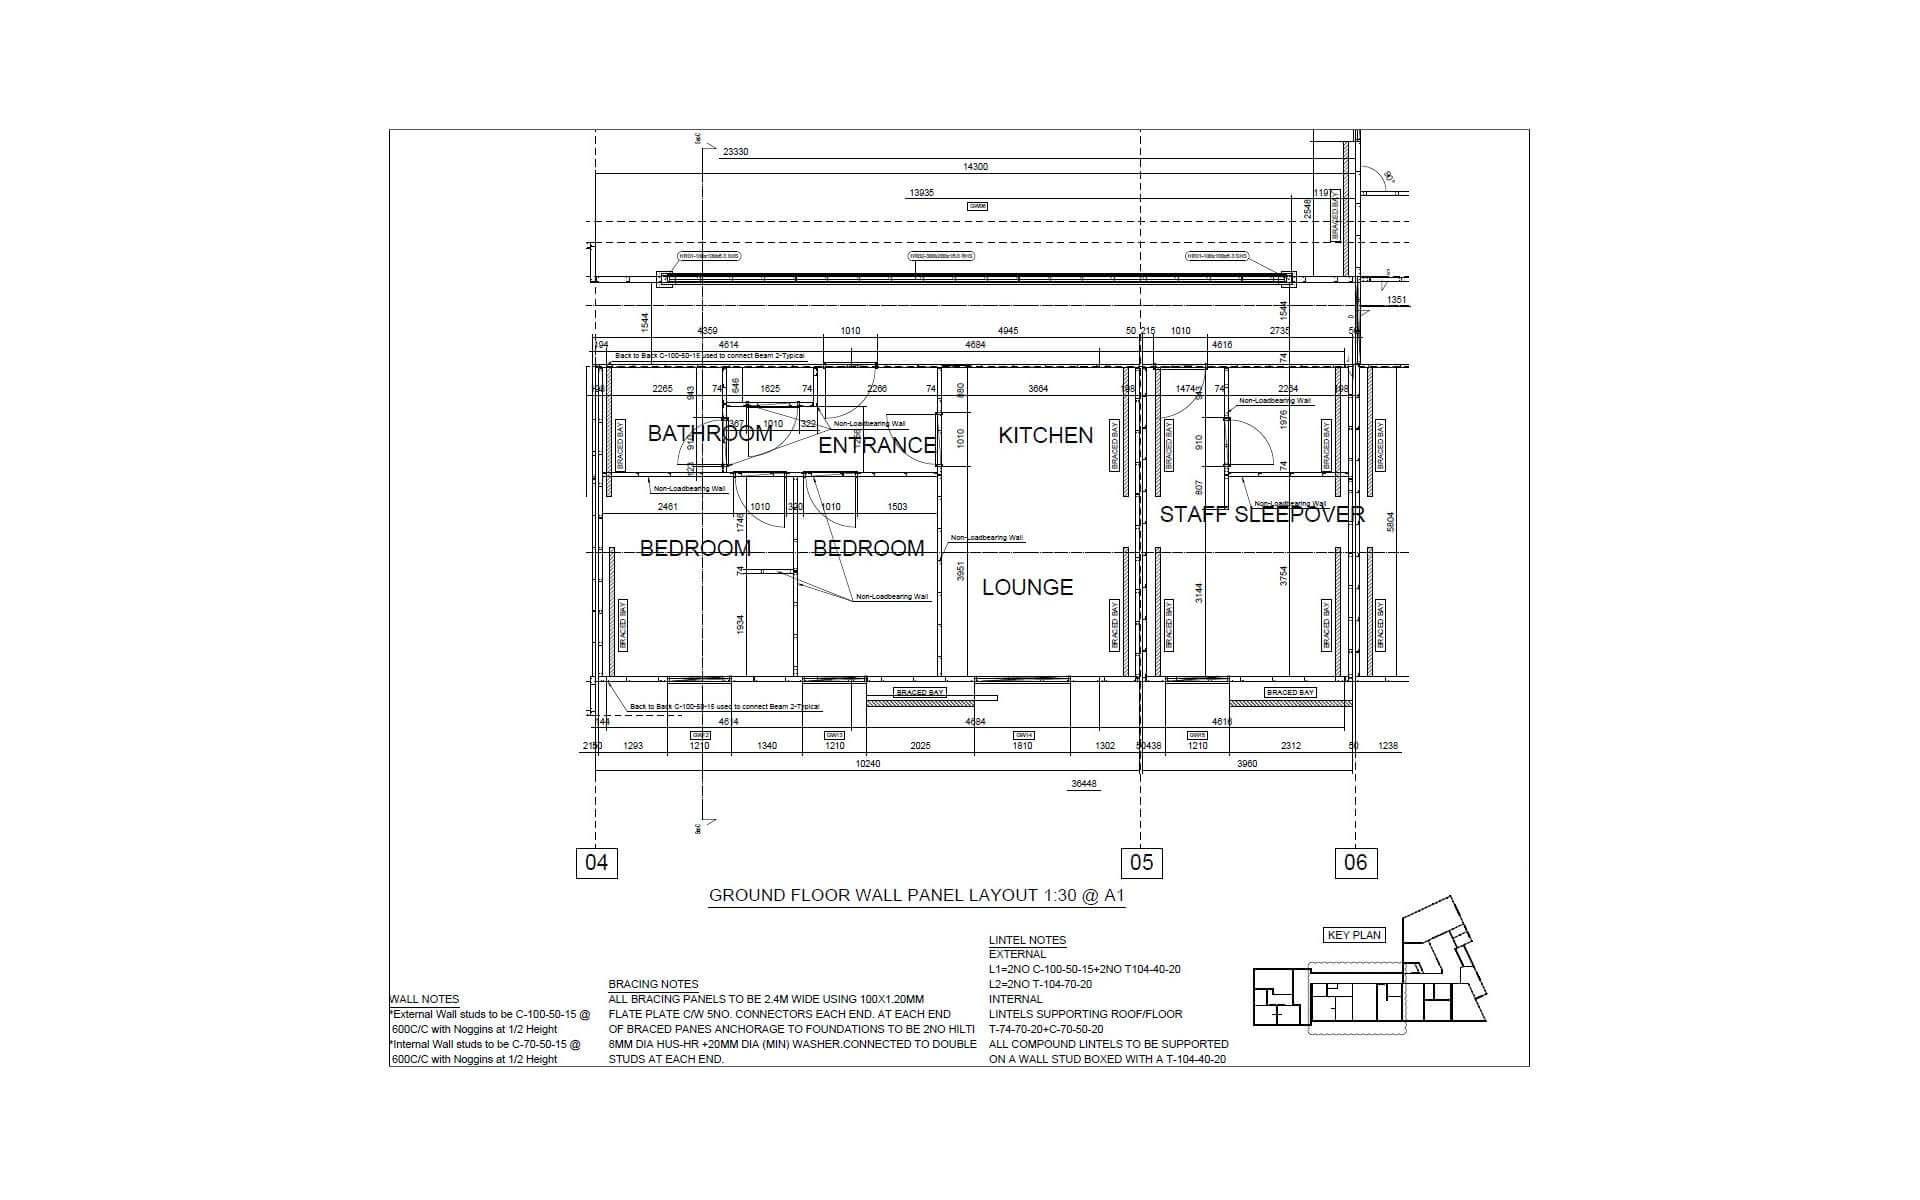 Vertex BD Wall Panel Layout